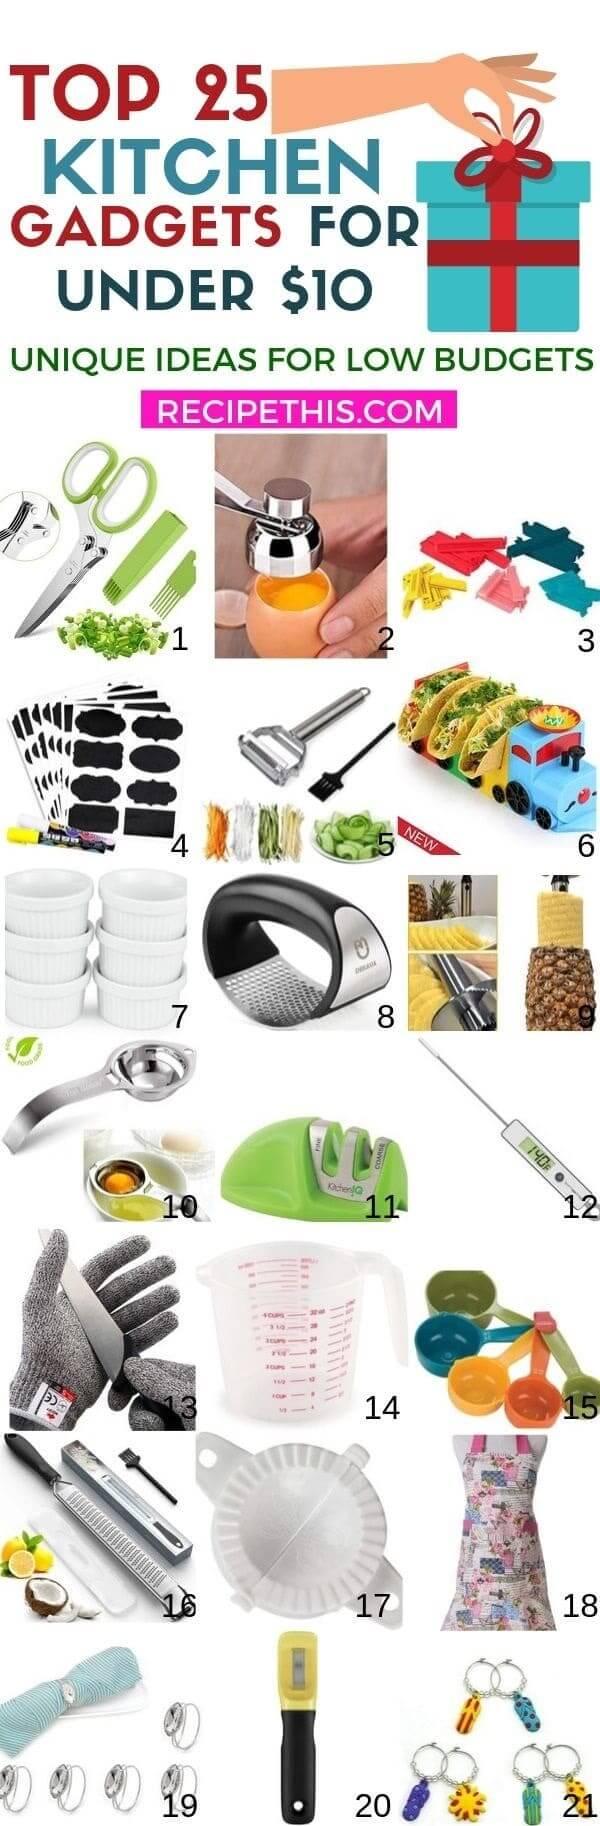 Top kitchen gadgets gift guide under 10 dollars